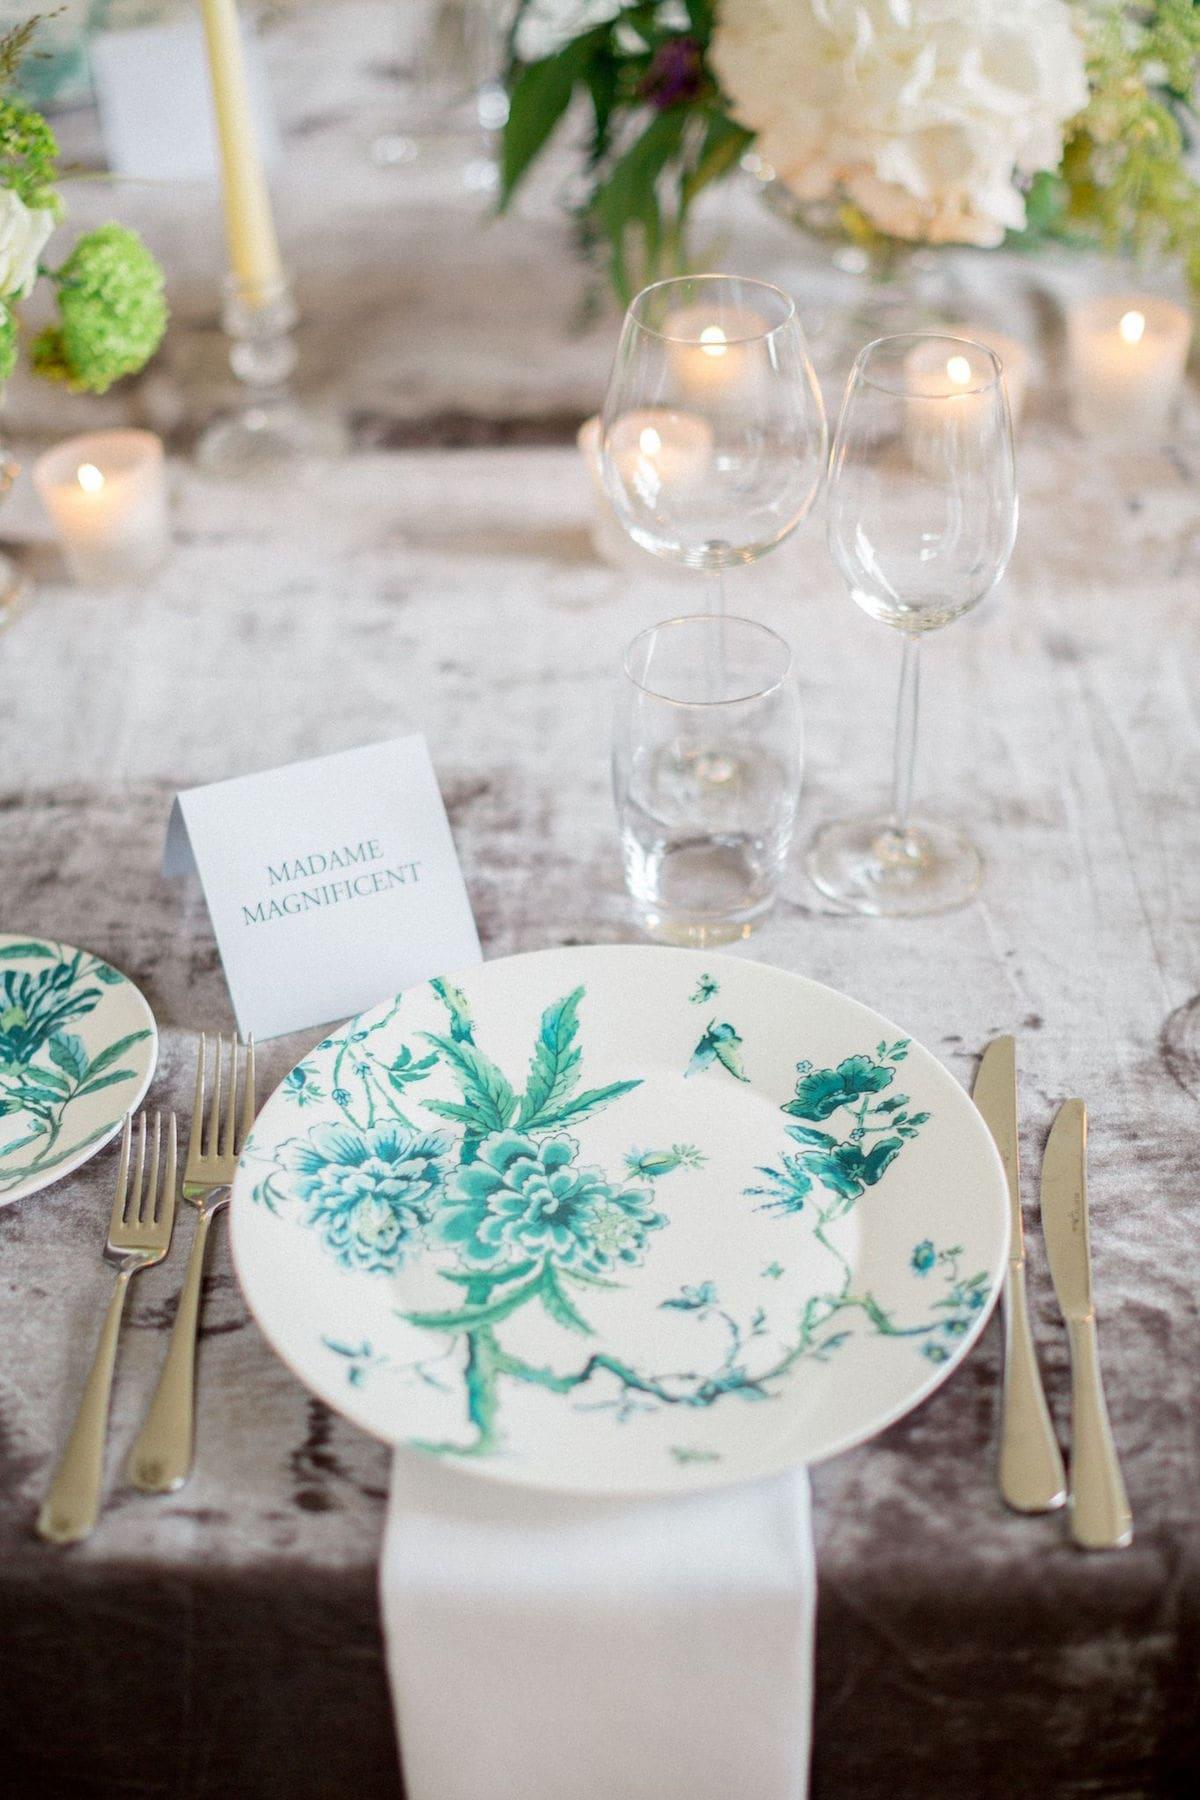 emerald pattern china for Irish destination wedding